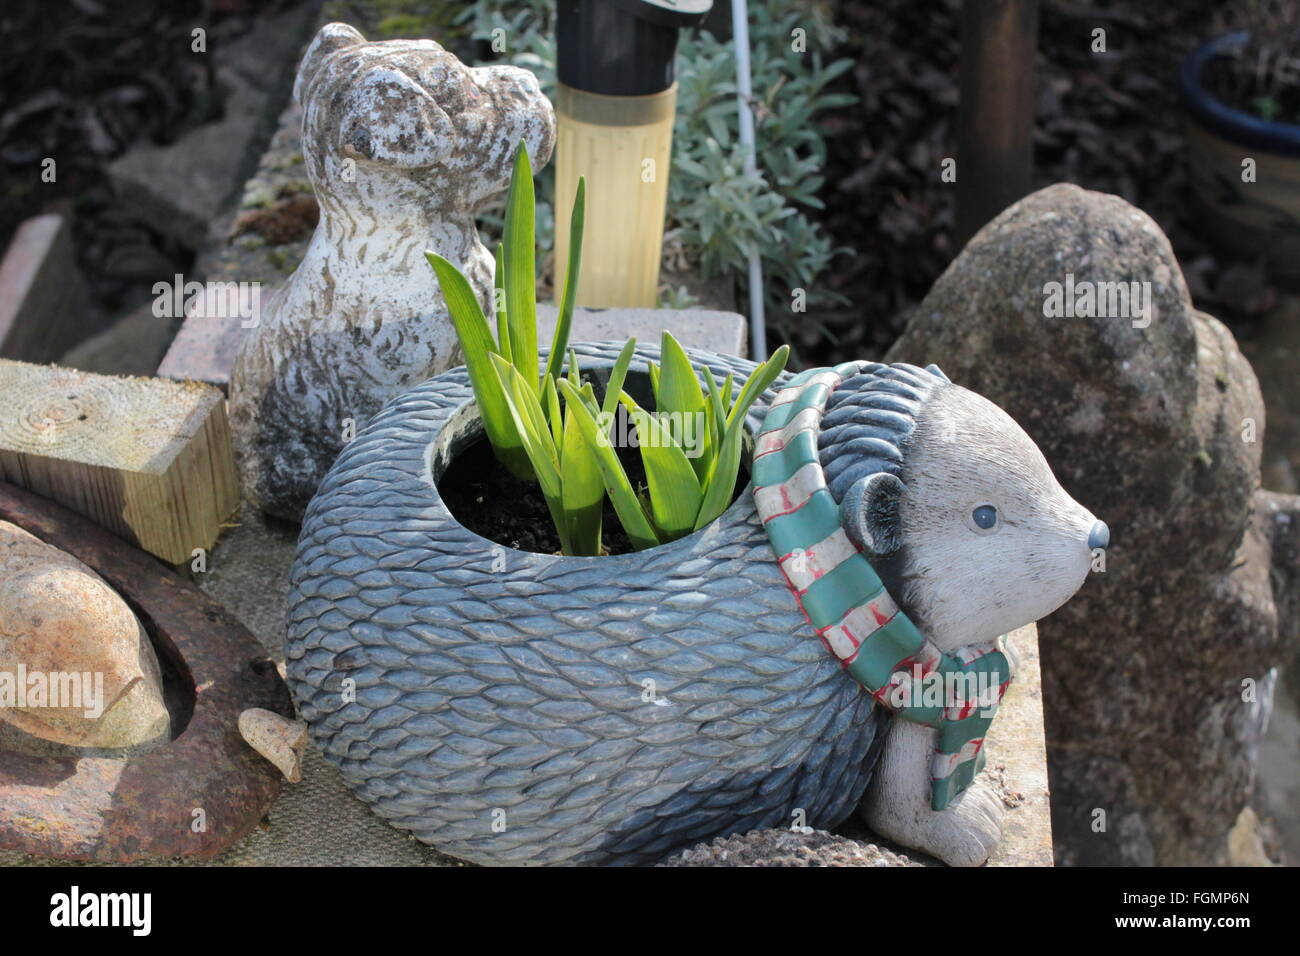 hedgehog comic planter and plant - Stock Image